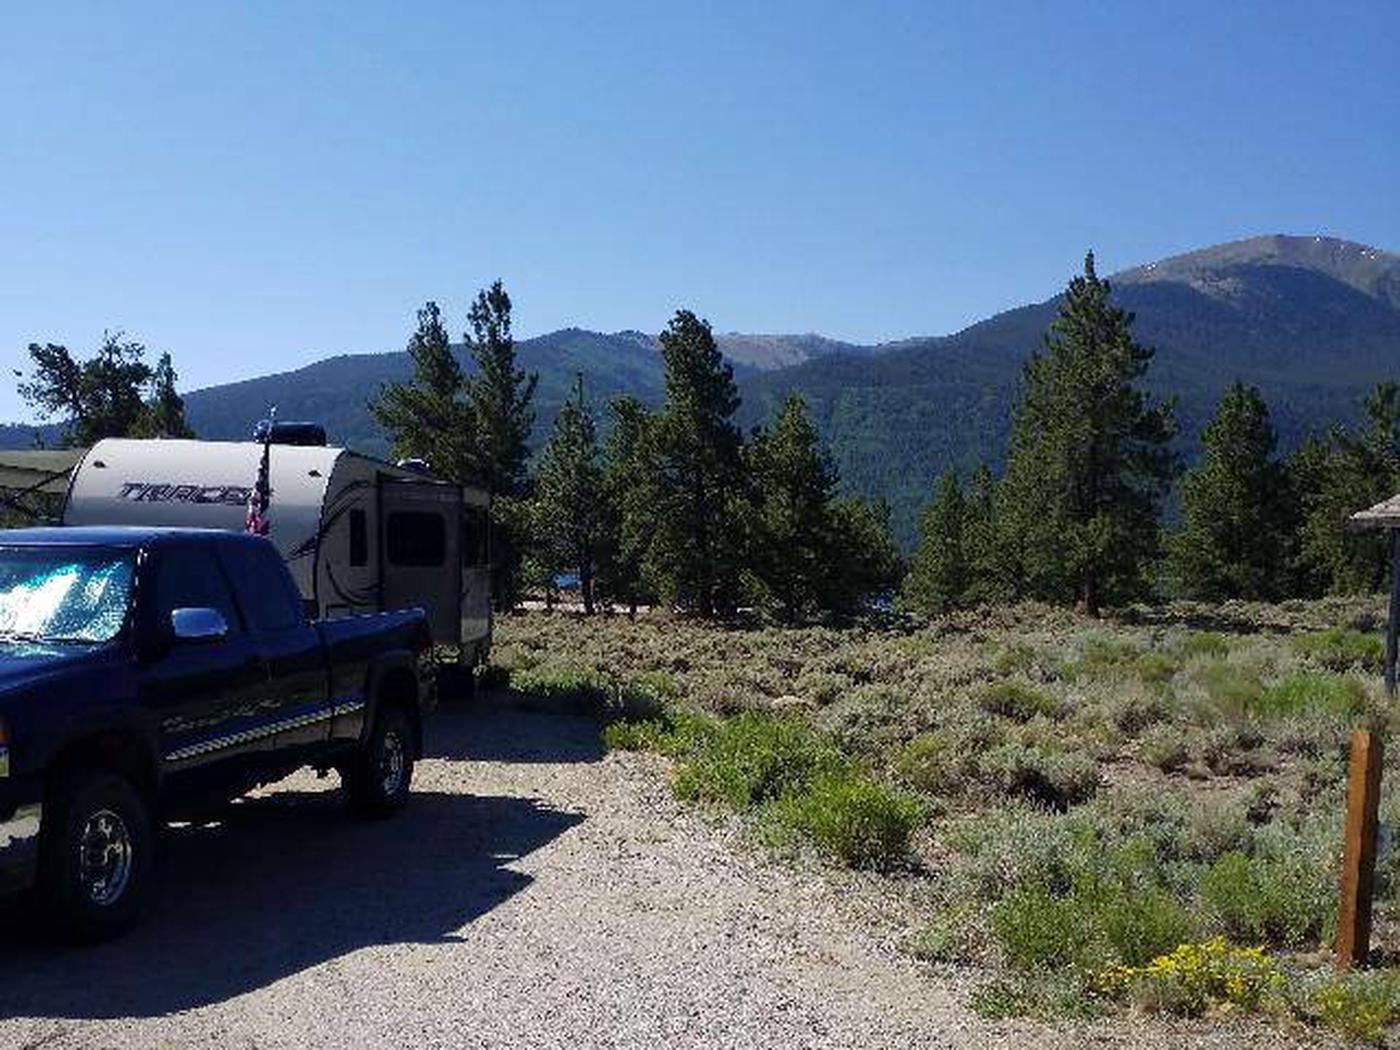 White Star Campground, site 20